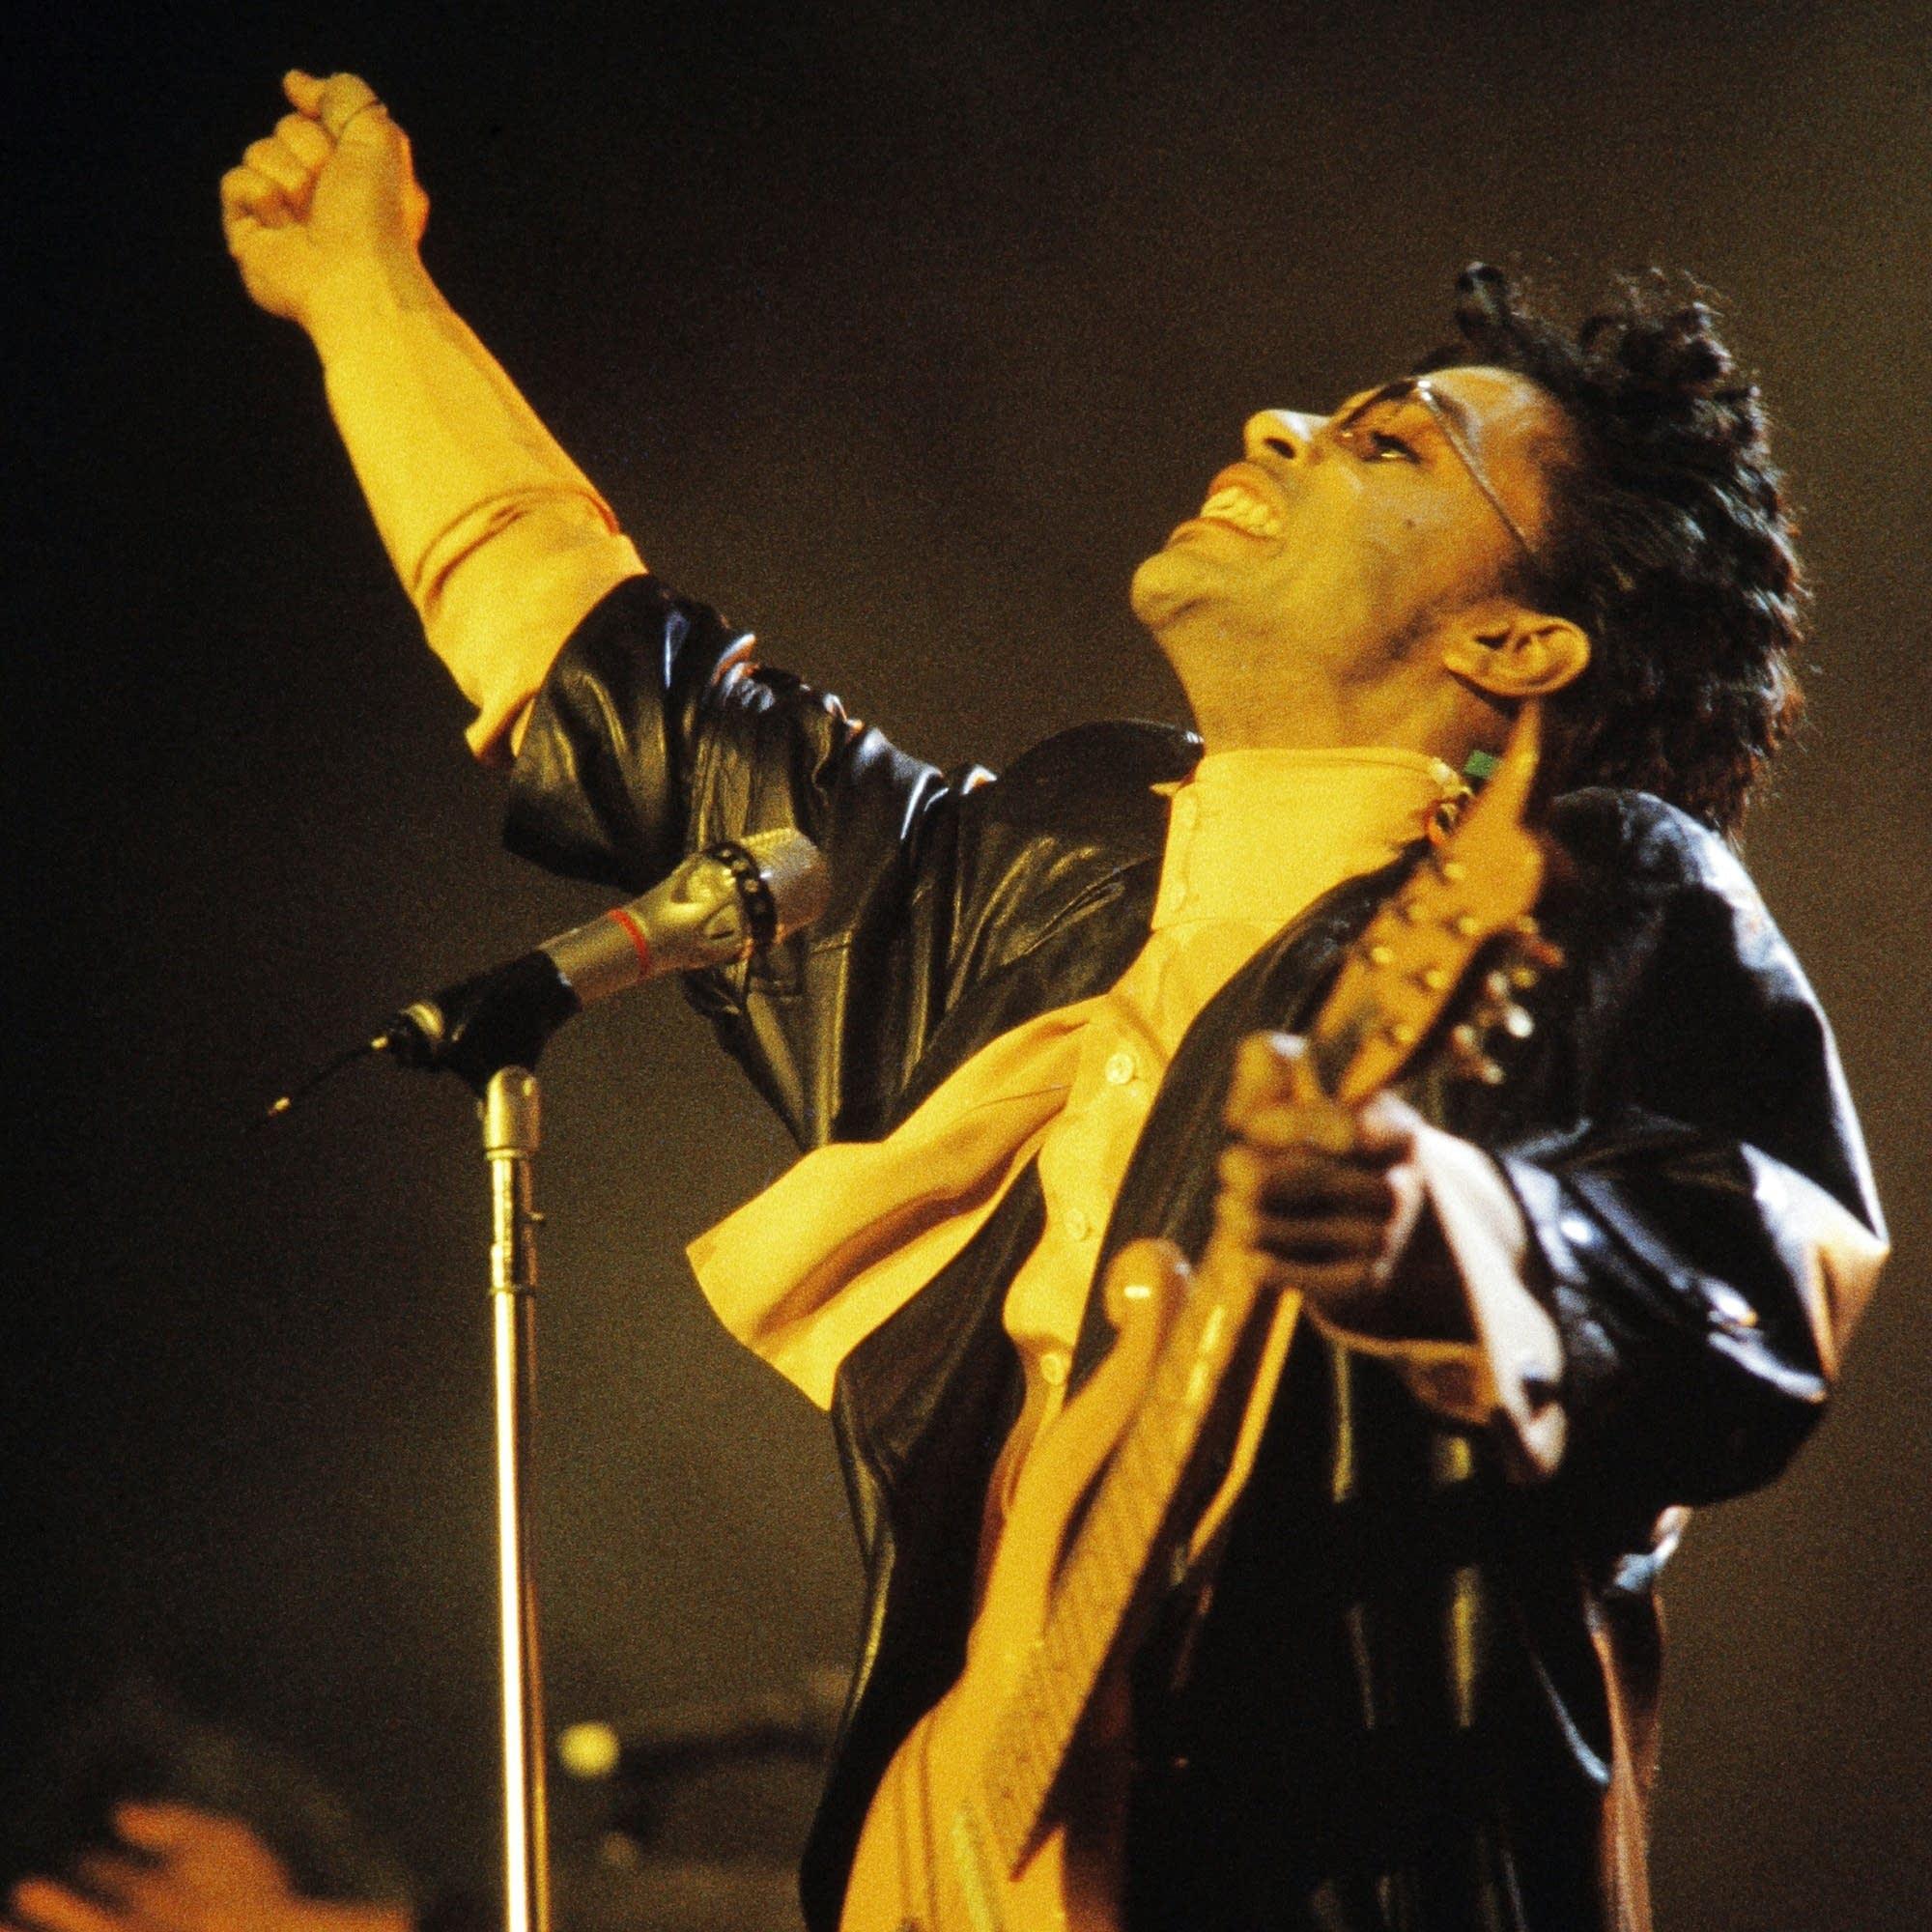 Prince performs in Paris, 1987.